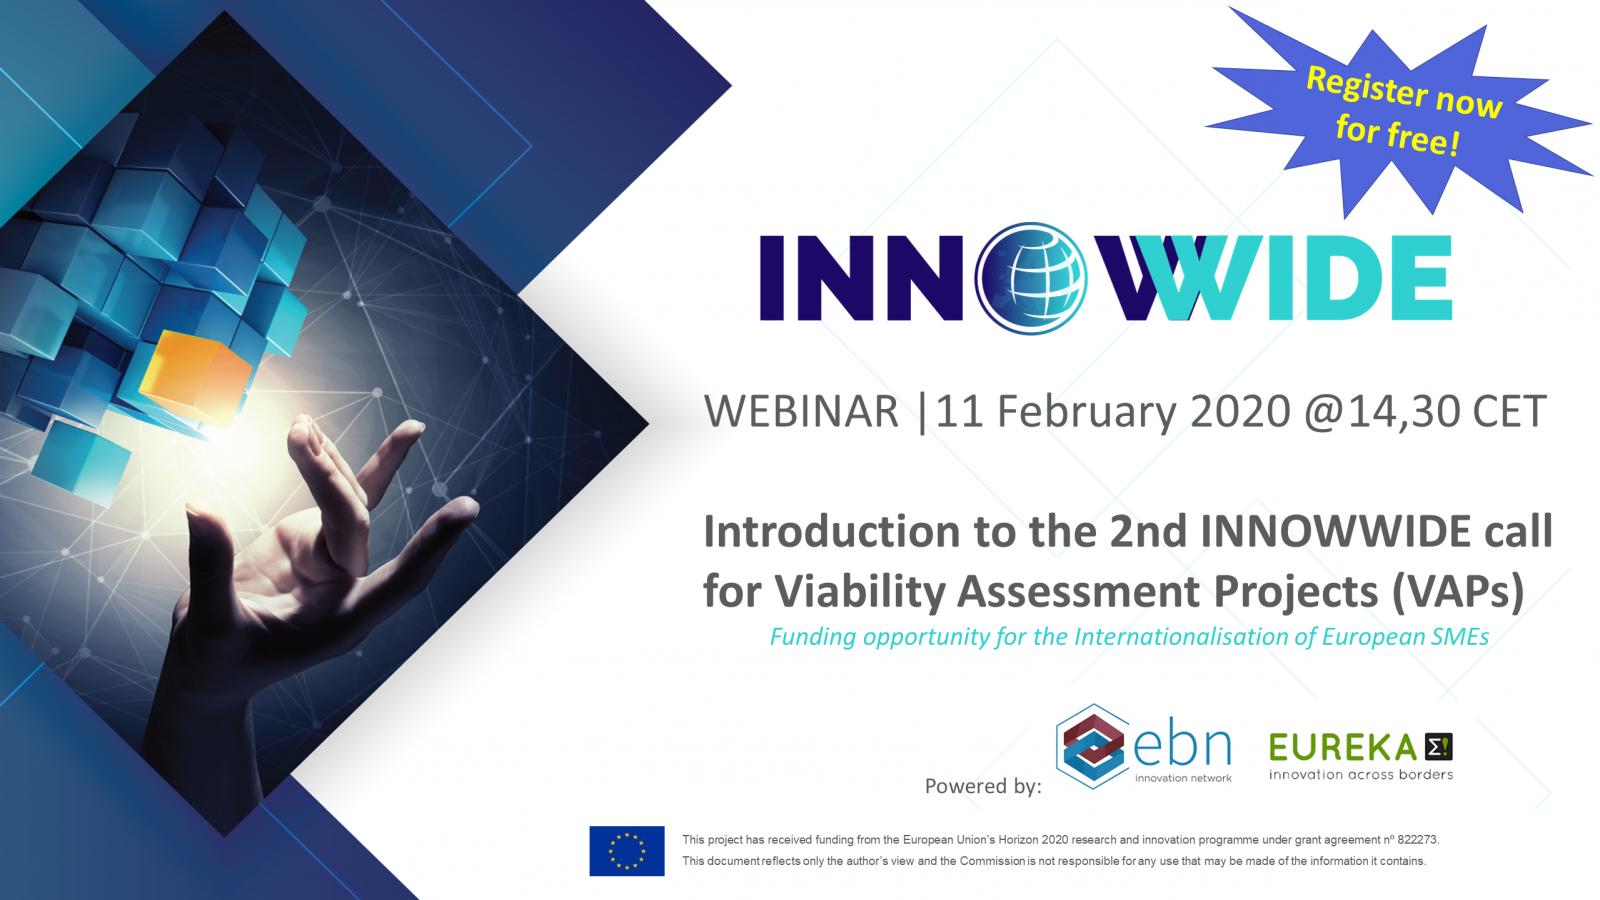 INNOWWIDE - Webinar 11 Feb 2020